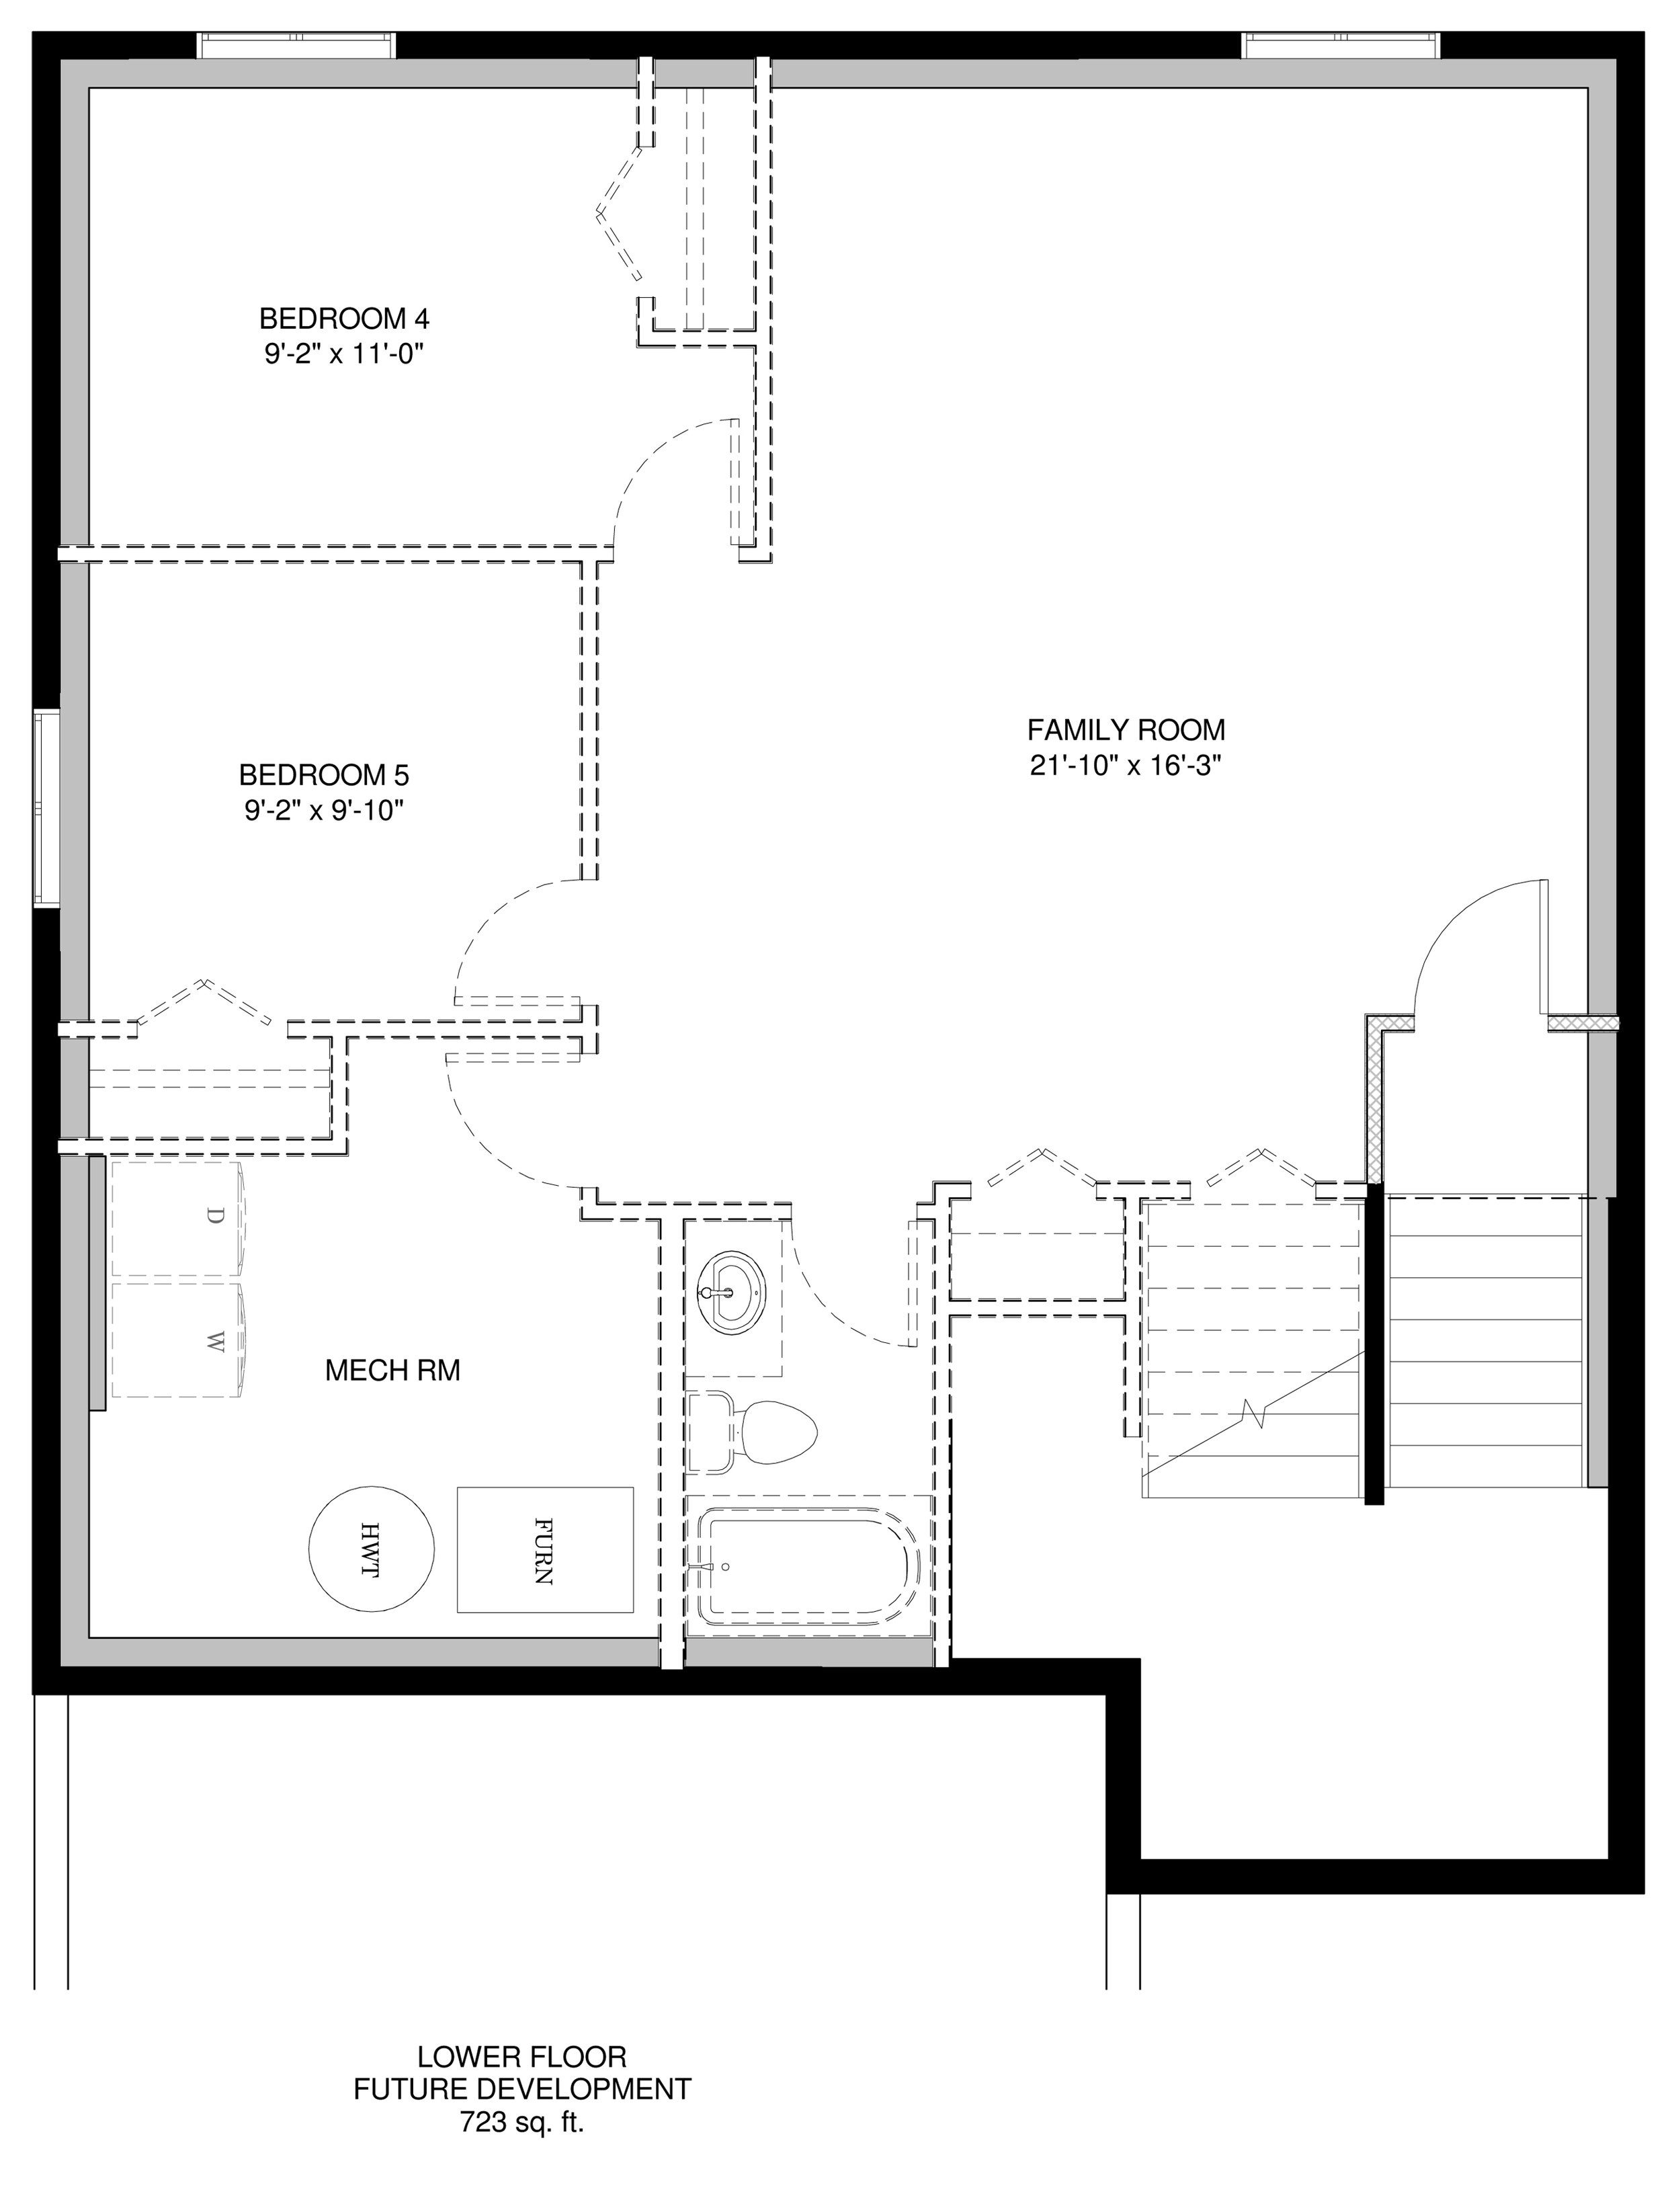 Lower Floor Future Development  723 sq ft